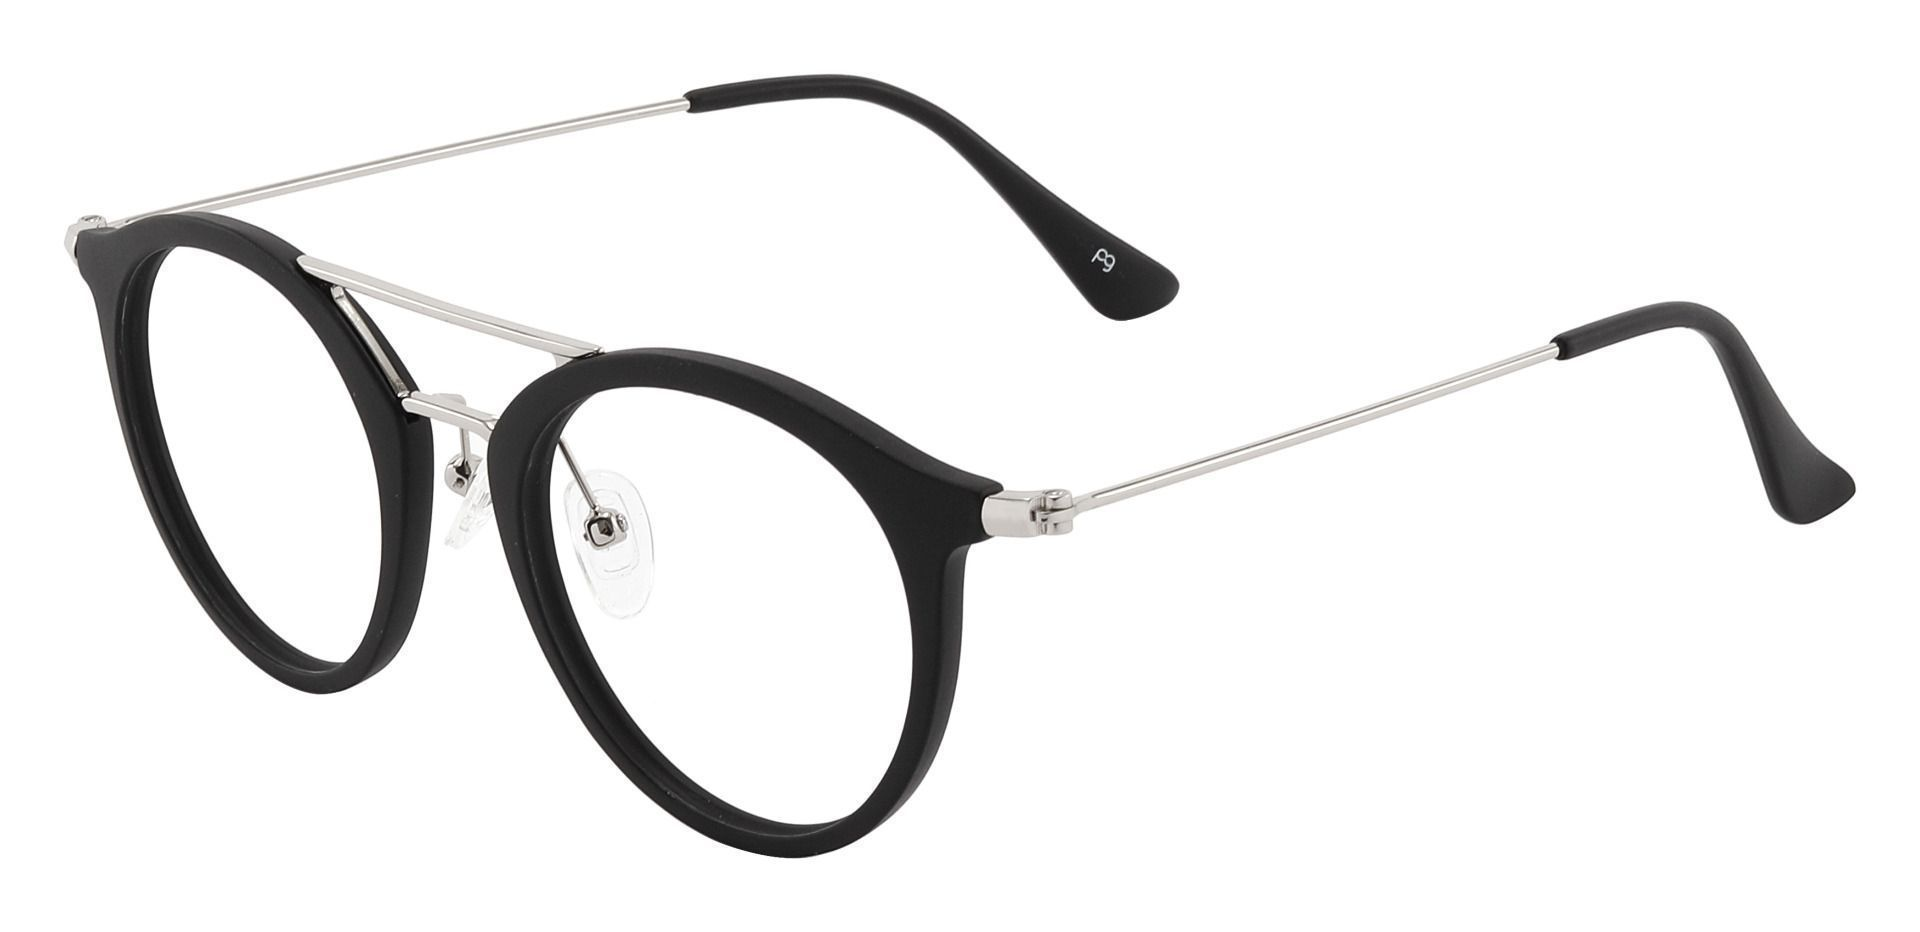 Malden Aviator Prescription Glasses - Black